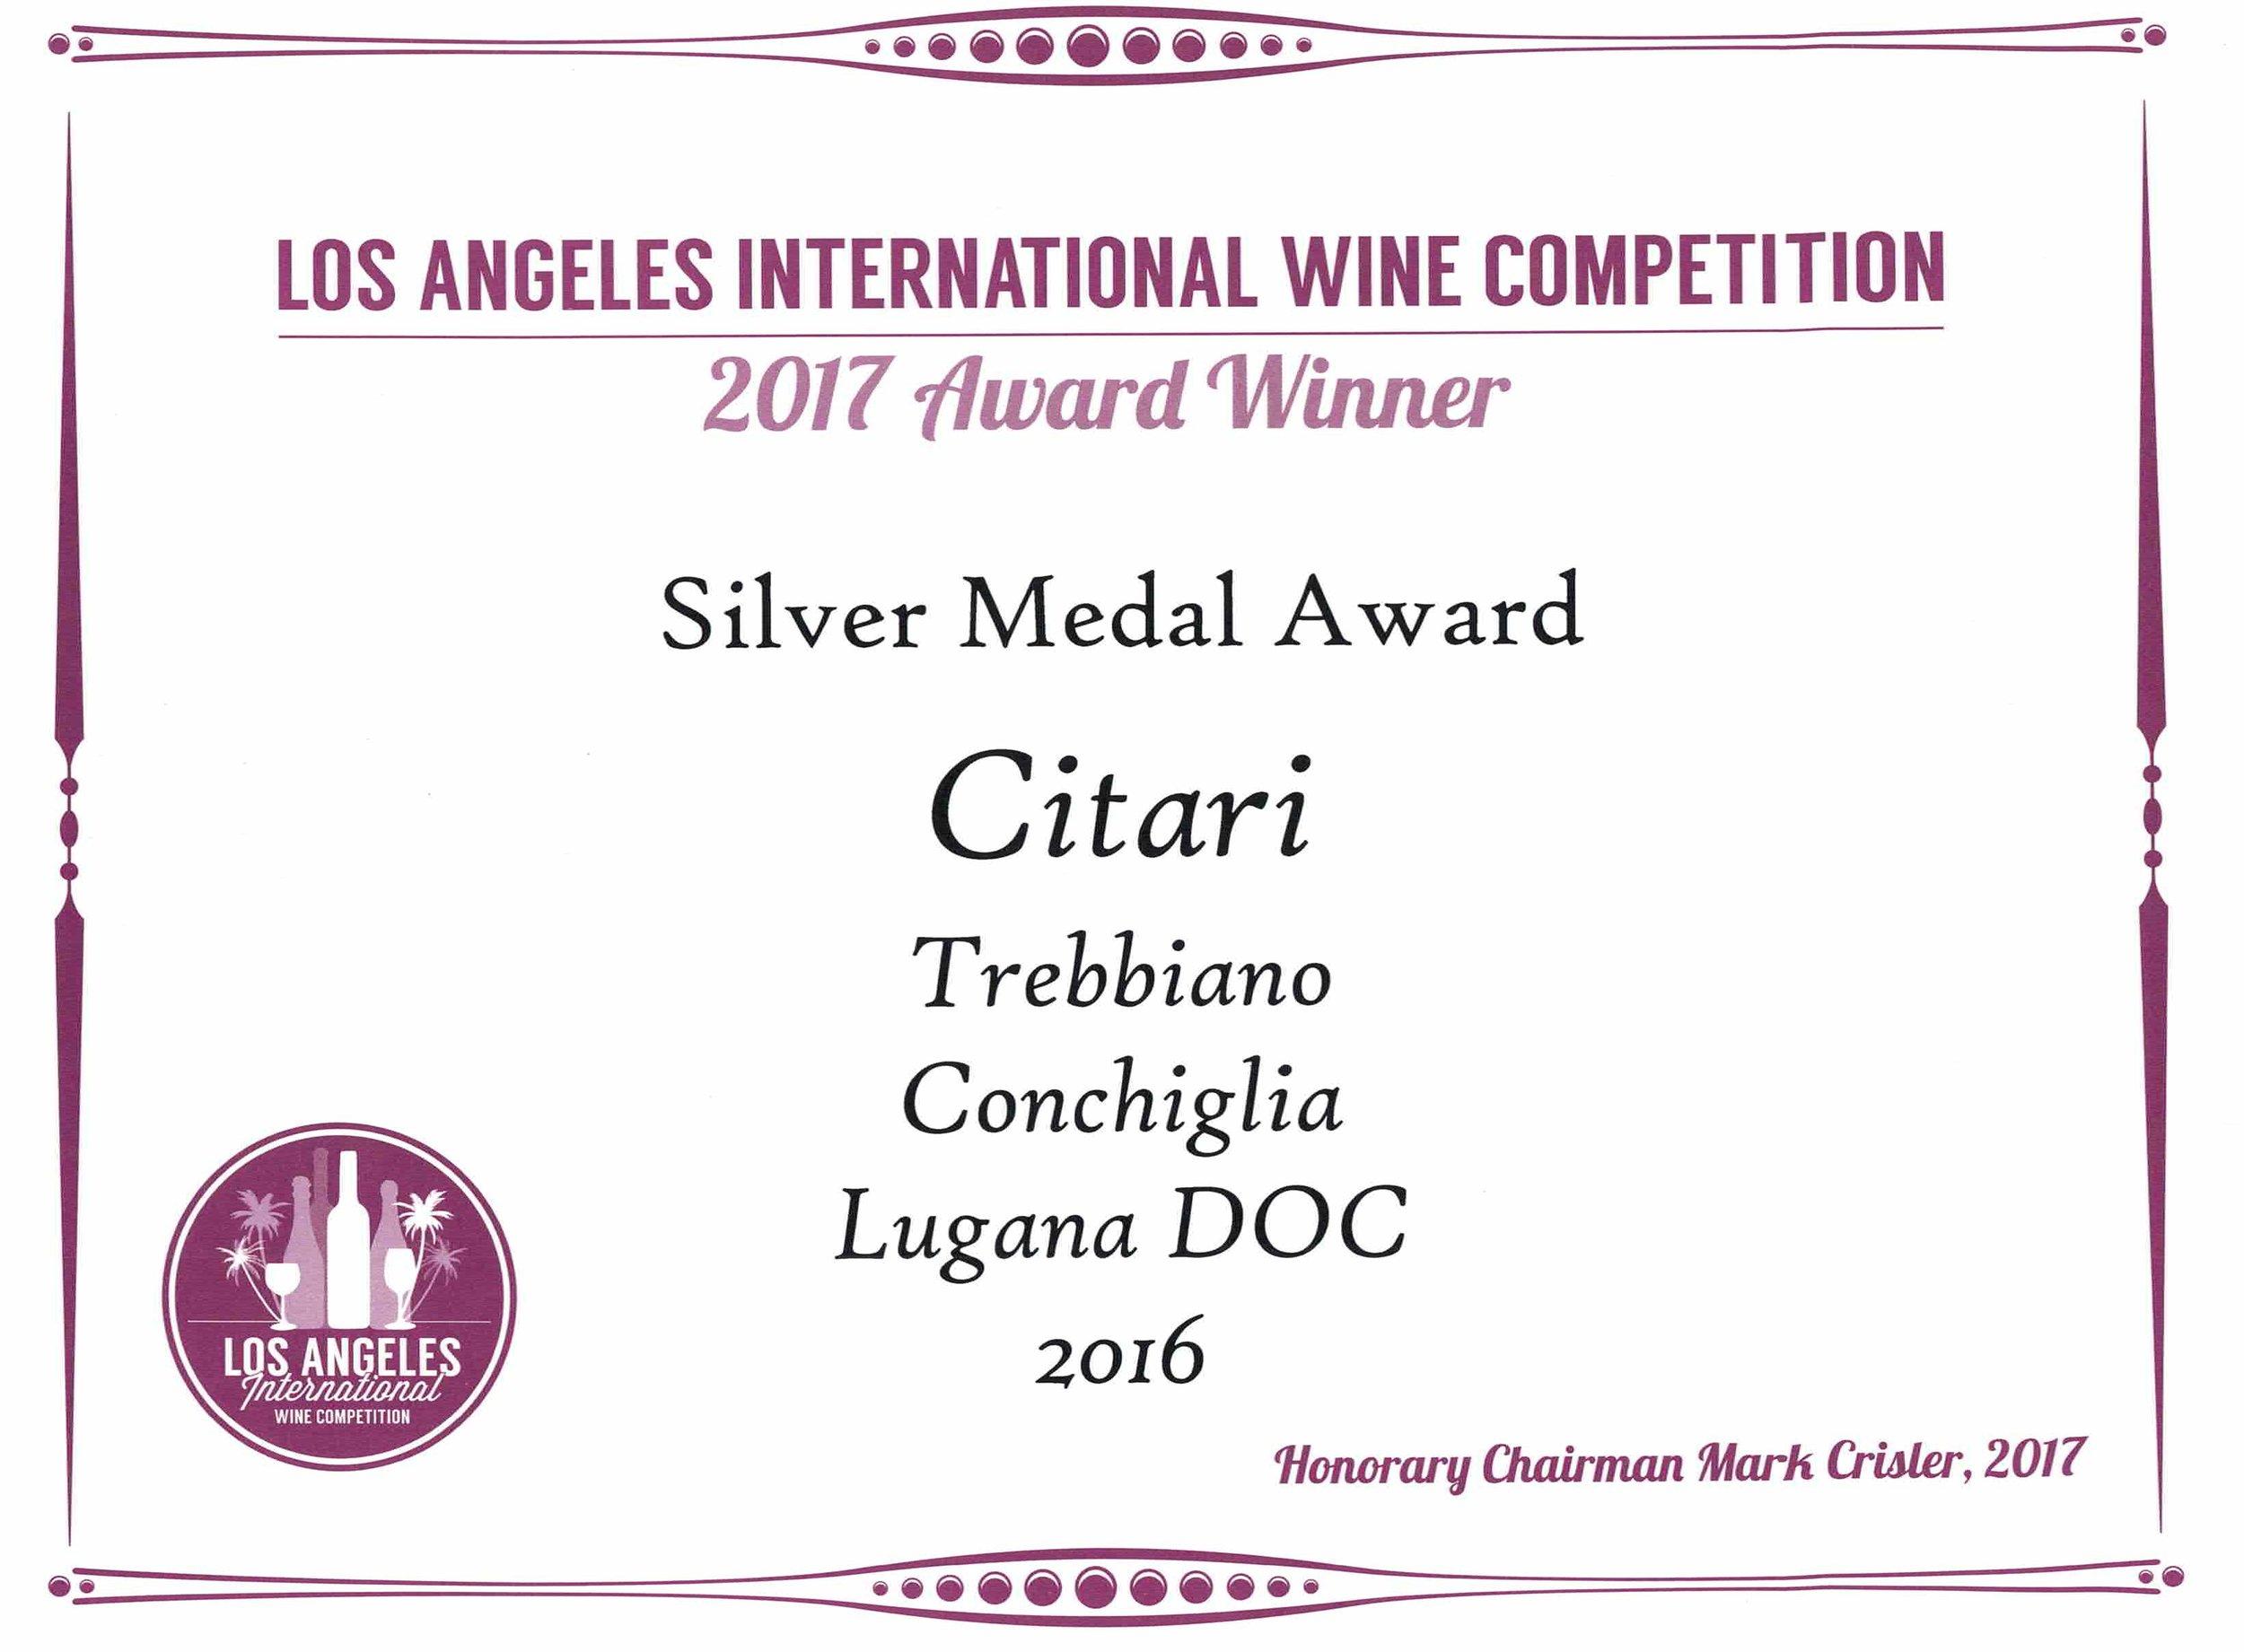 Lugana Conchiglia 2016 Silver Medal jpg orizzontale.jpg